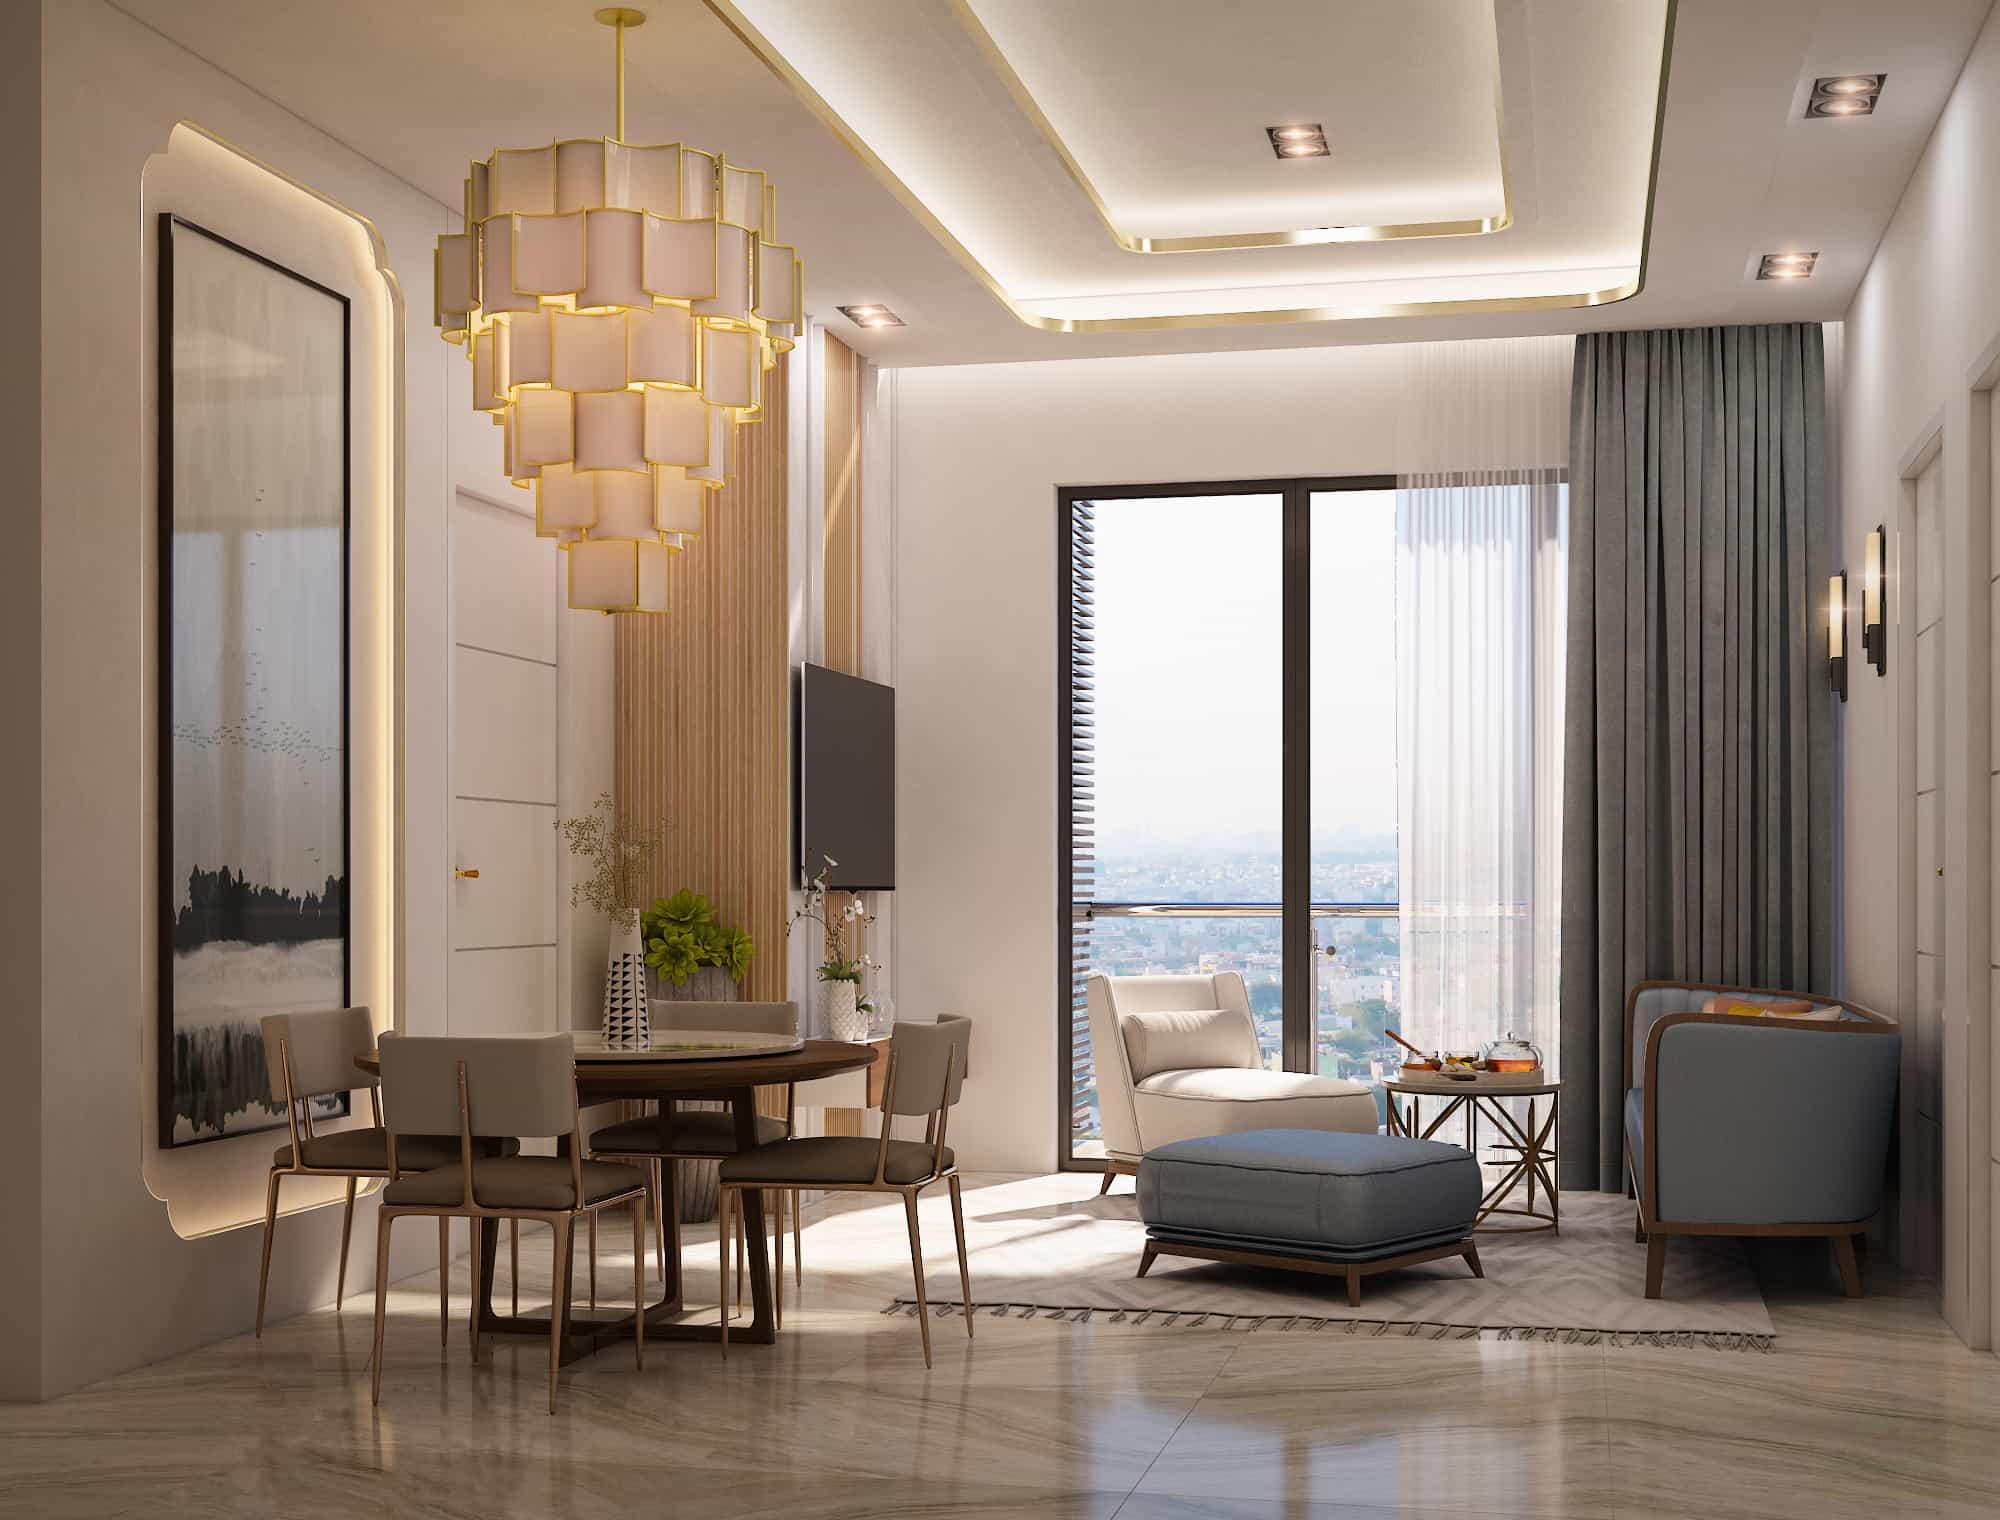 thiết kế căn hộ d homme quận 6